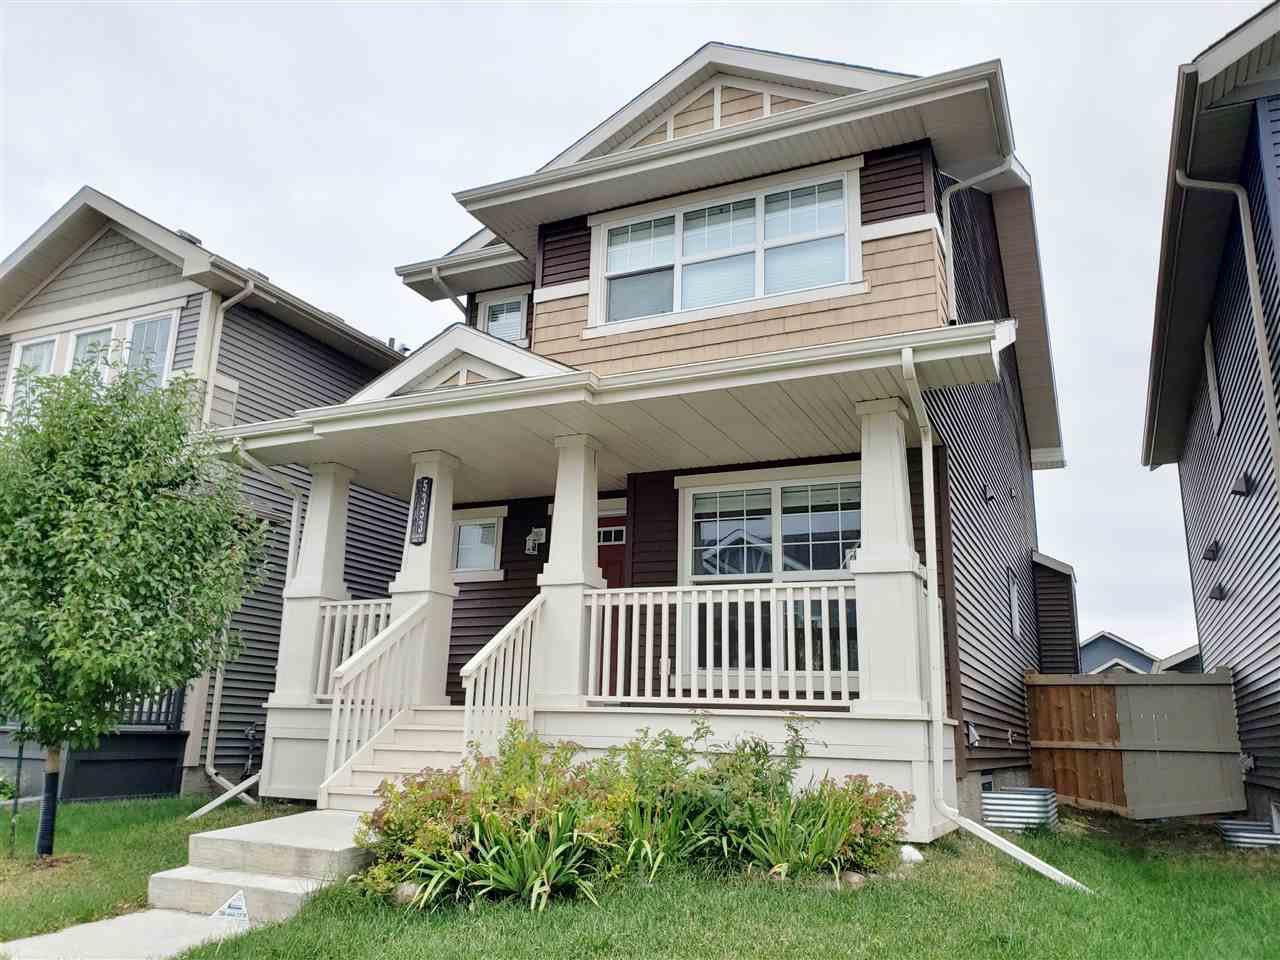 Main Photo: 5353 CRABAPPLE Loop in Edmonton: Zone 53 House for sale : MLS®# E4174288